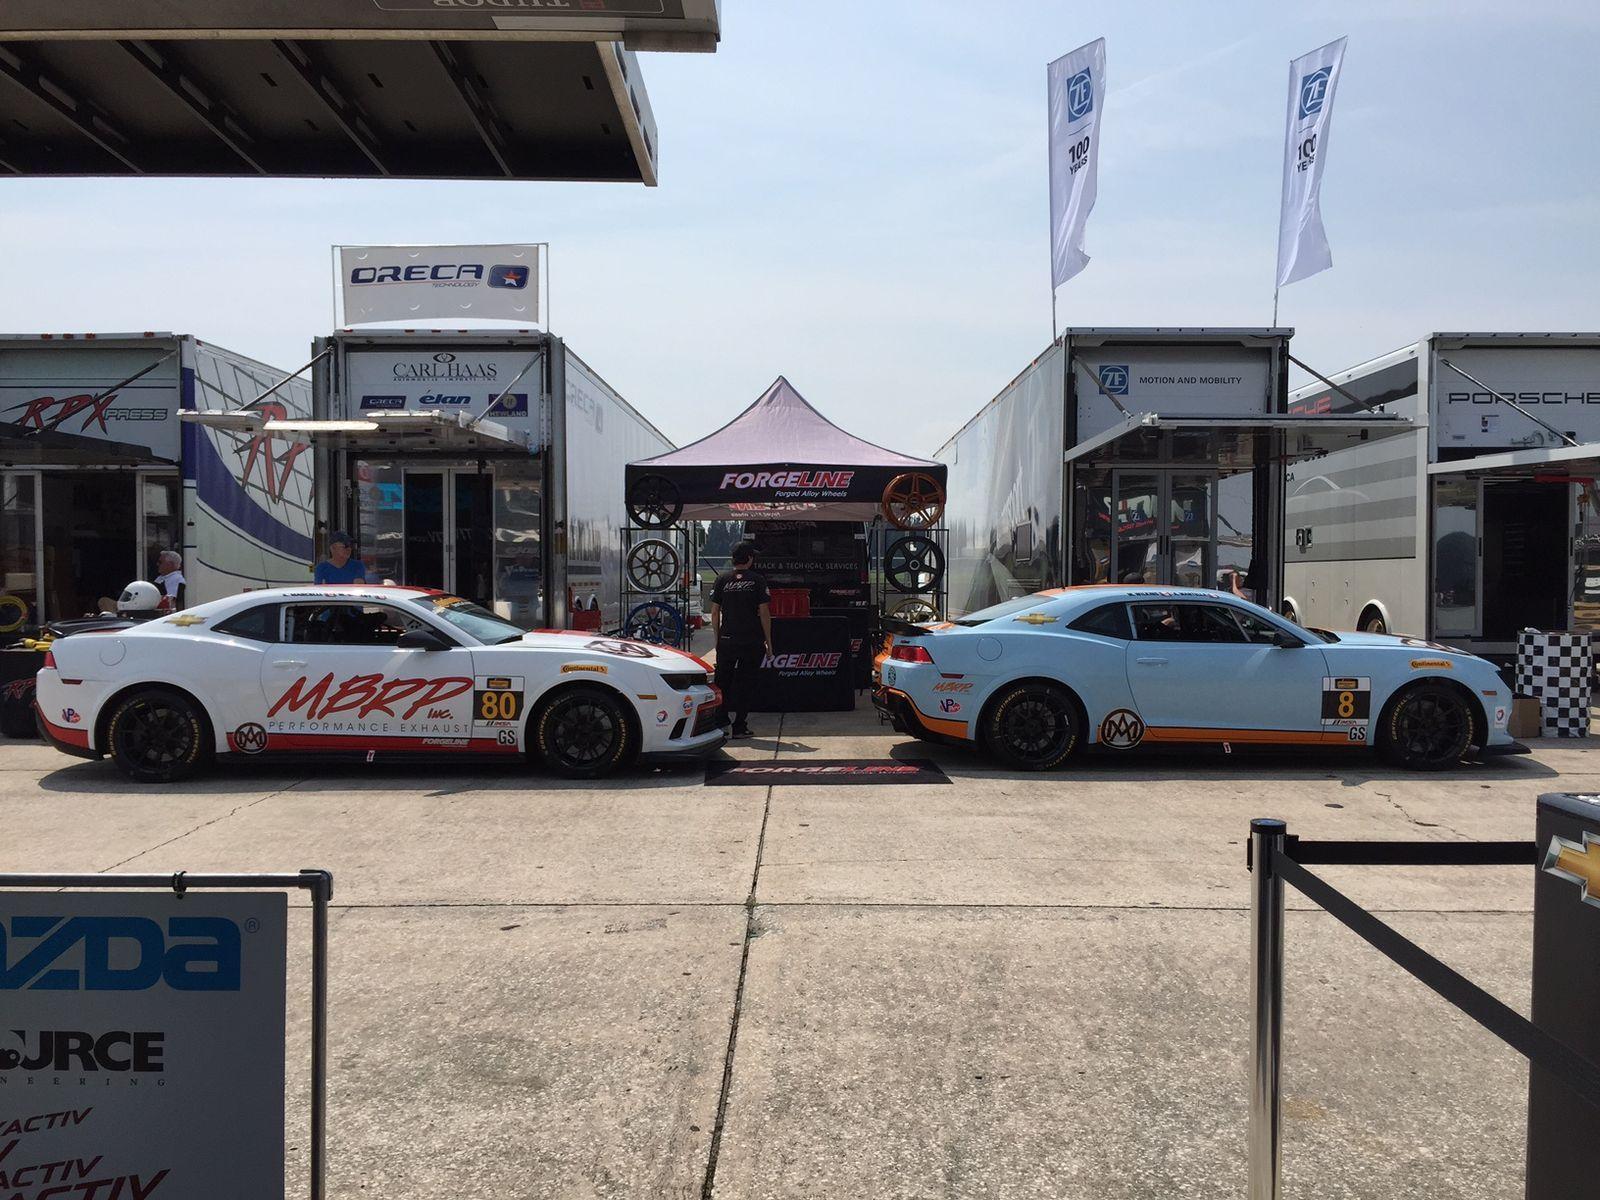 2014 Chevrolet Camaro |  Mantella Autosport Camaros at Sebring 2015